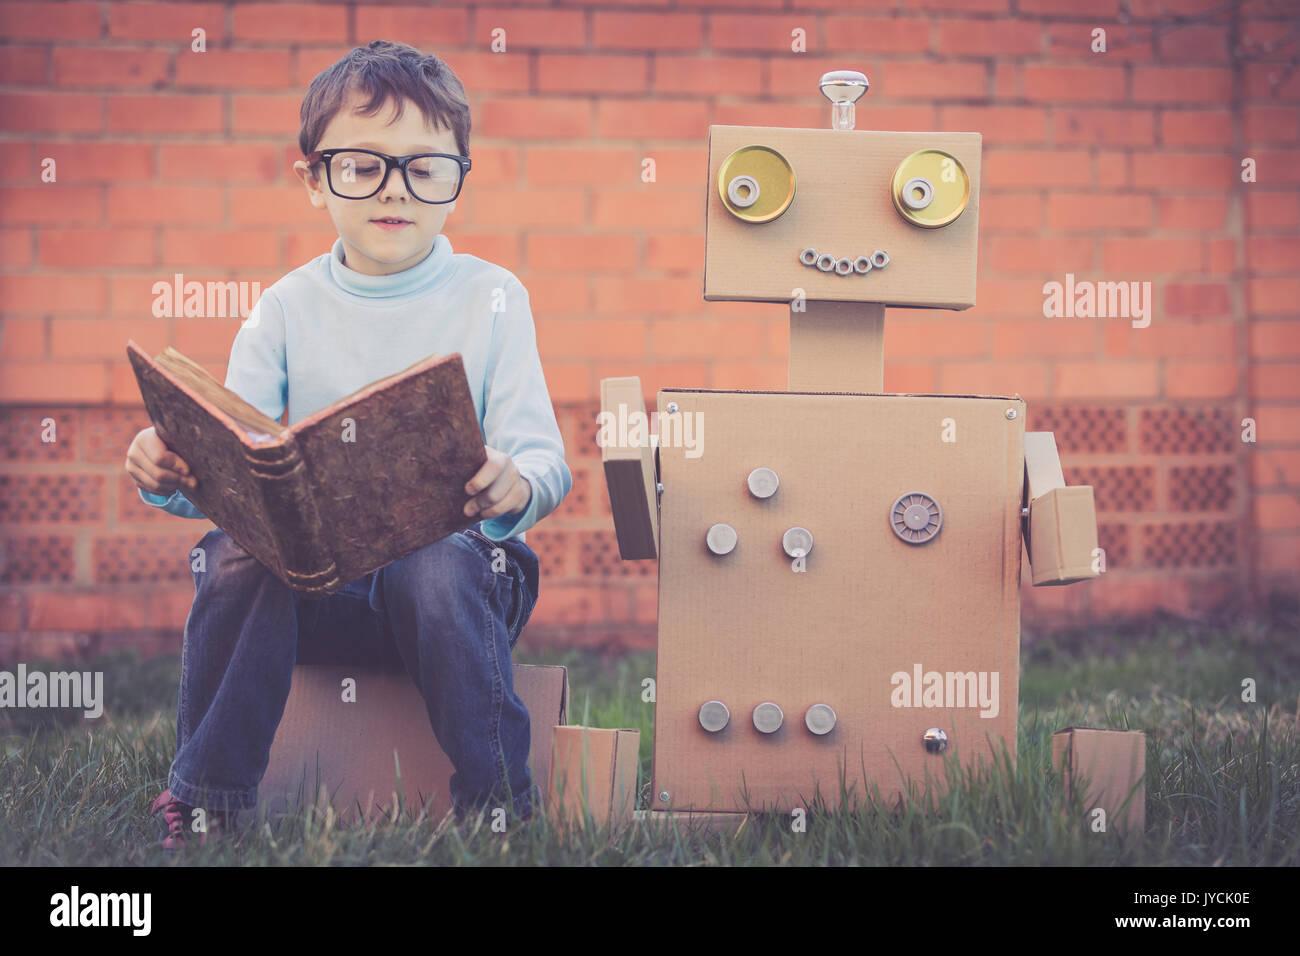 bo cardboard robot reading - photo #14